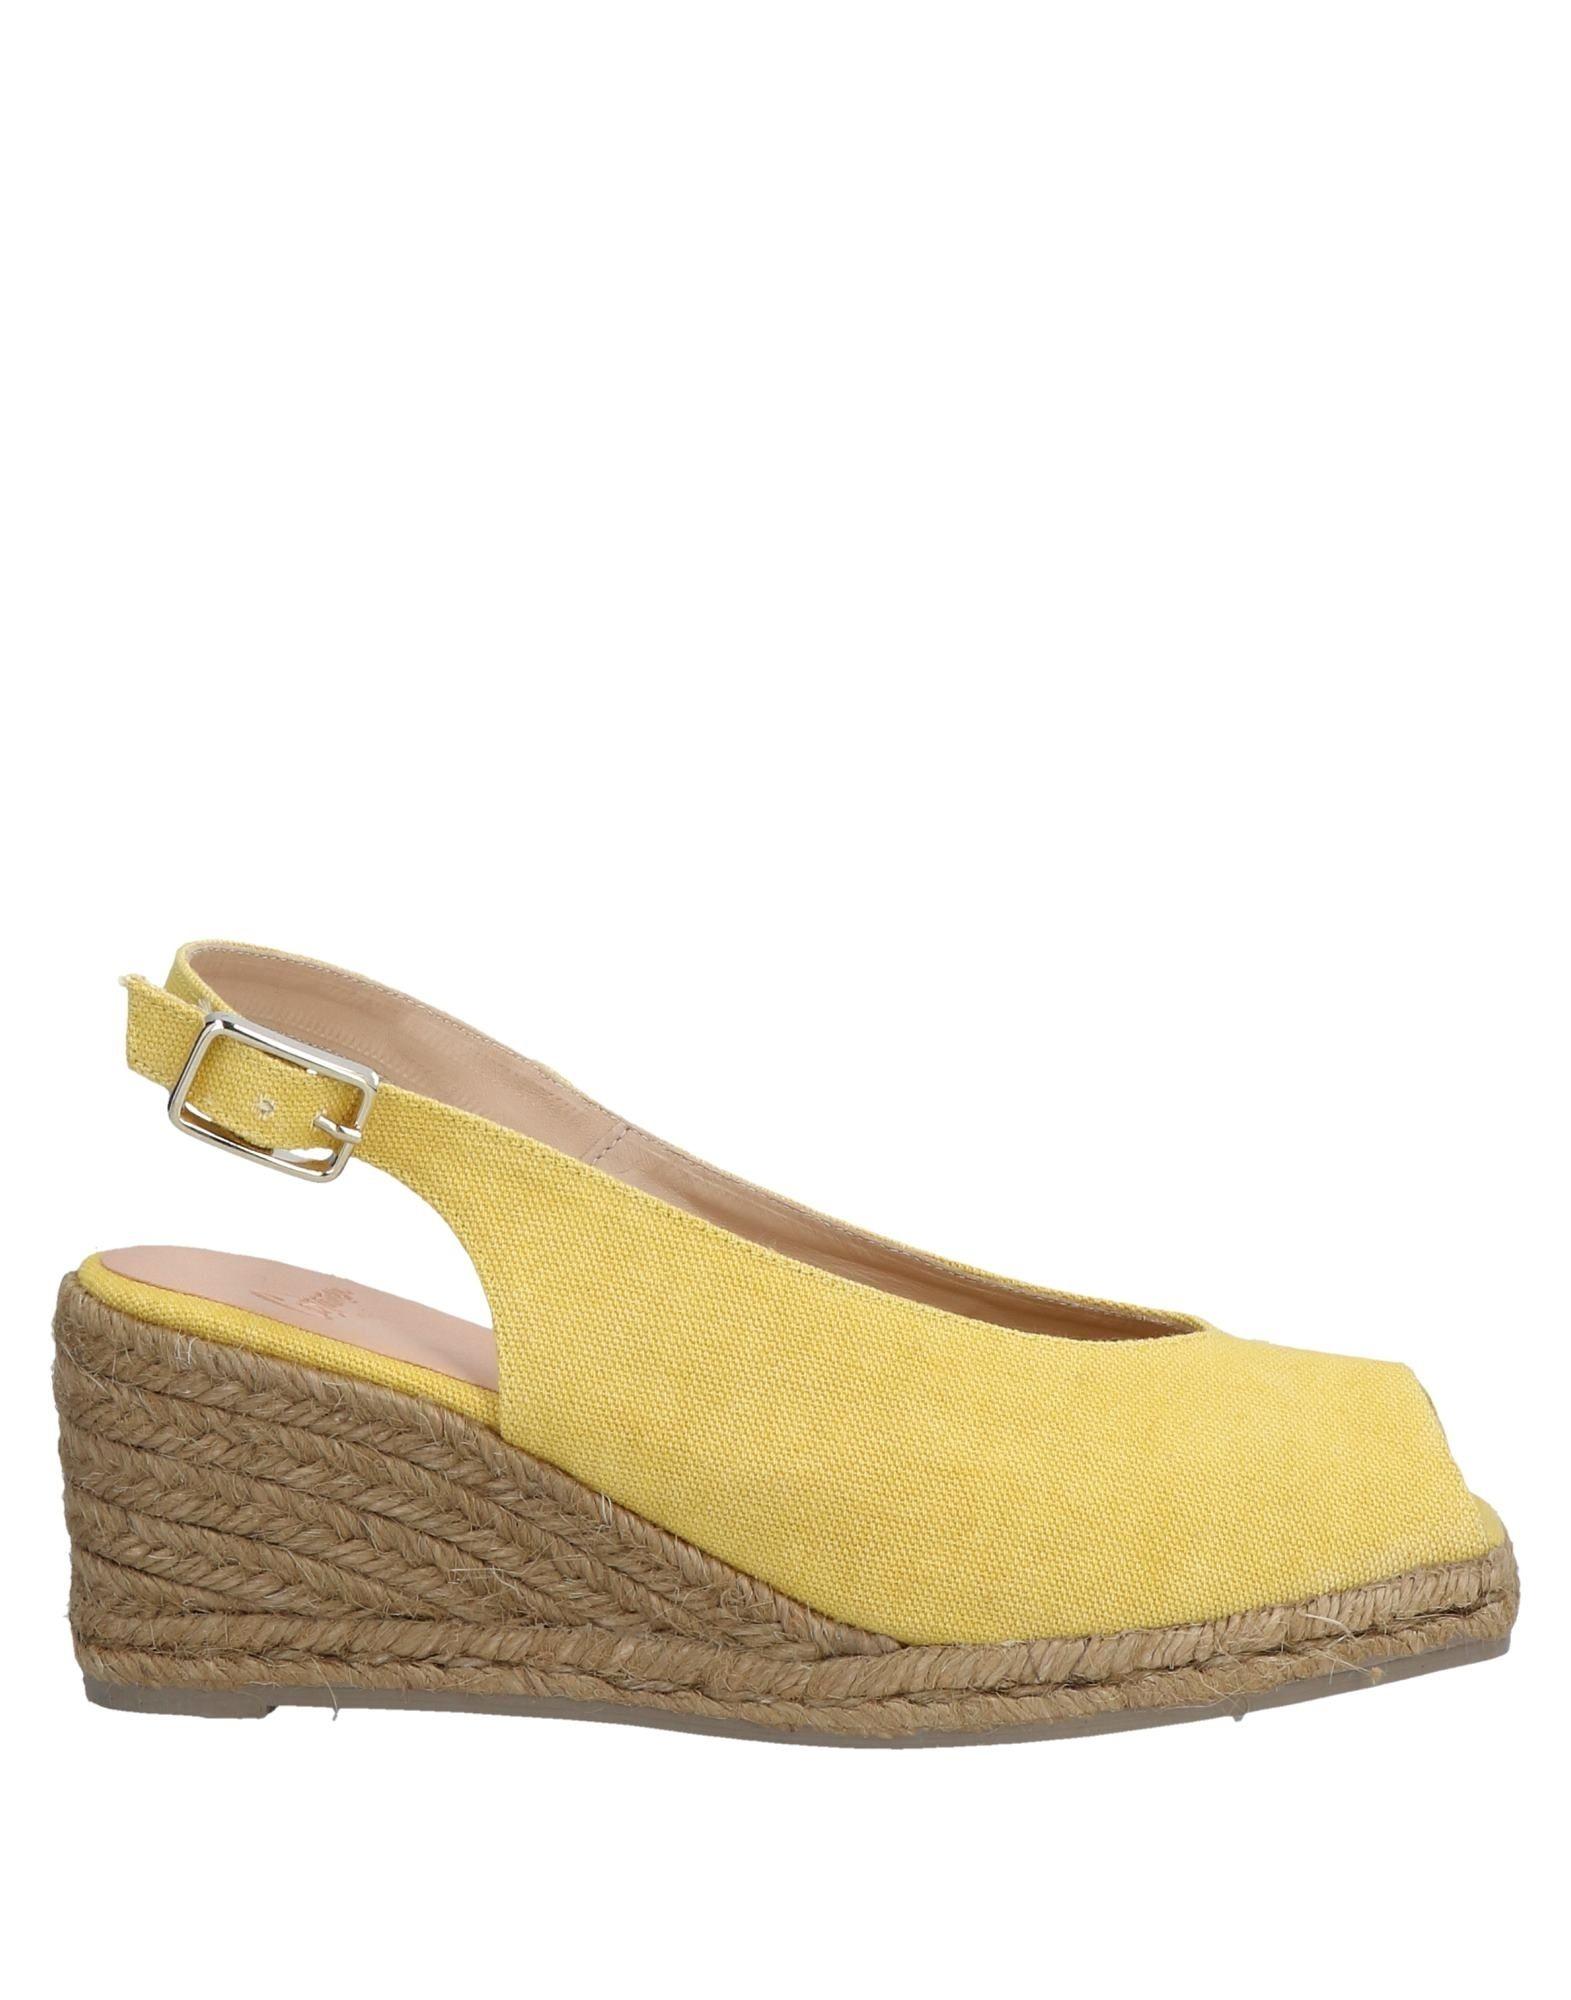 Castañer Sandals - Women Castañer Sandals online on 11462934BA  United Kingdom - 11462934BA on 11ffda